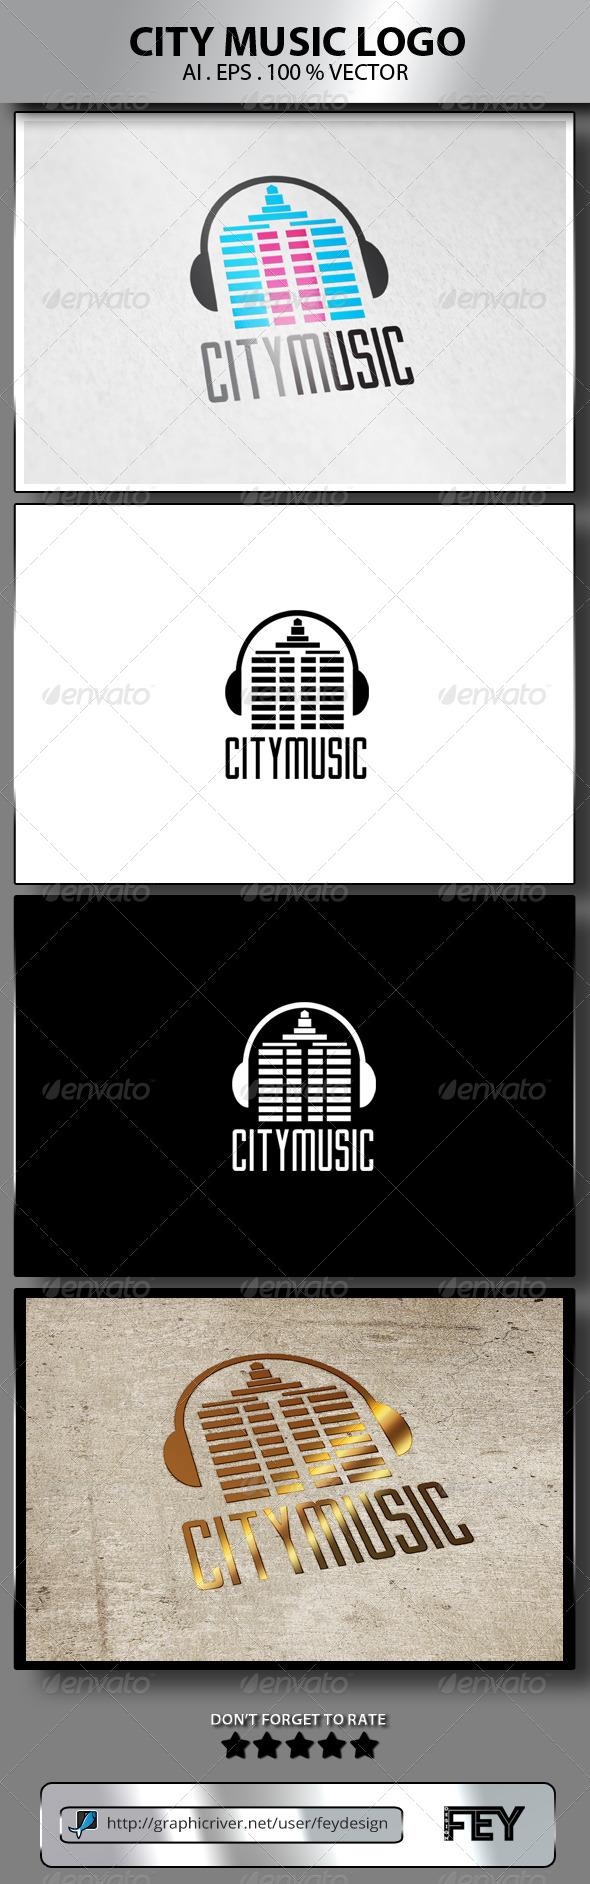 City Music Logo